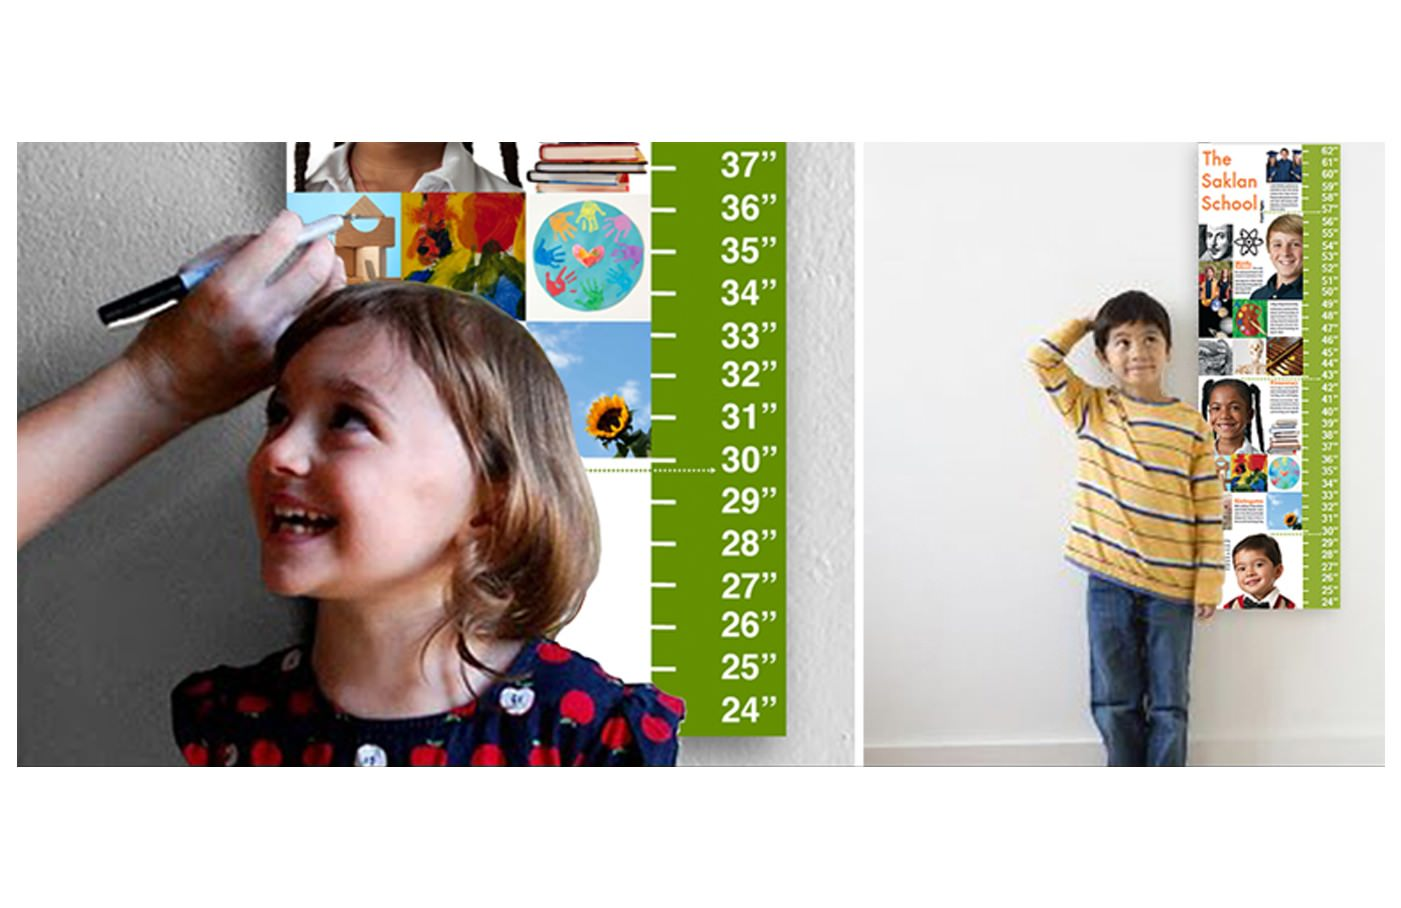 Angela_Dunkle_Creative_Director___SAKLAN_SCHOOL_MAILER_GROWTH_CHART_KIDS copy.jpg